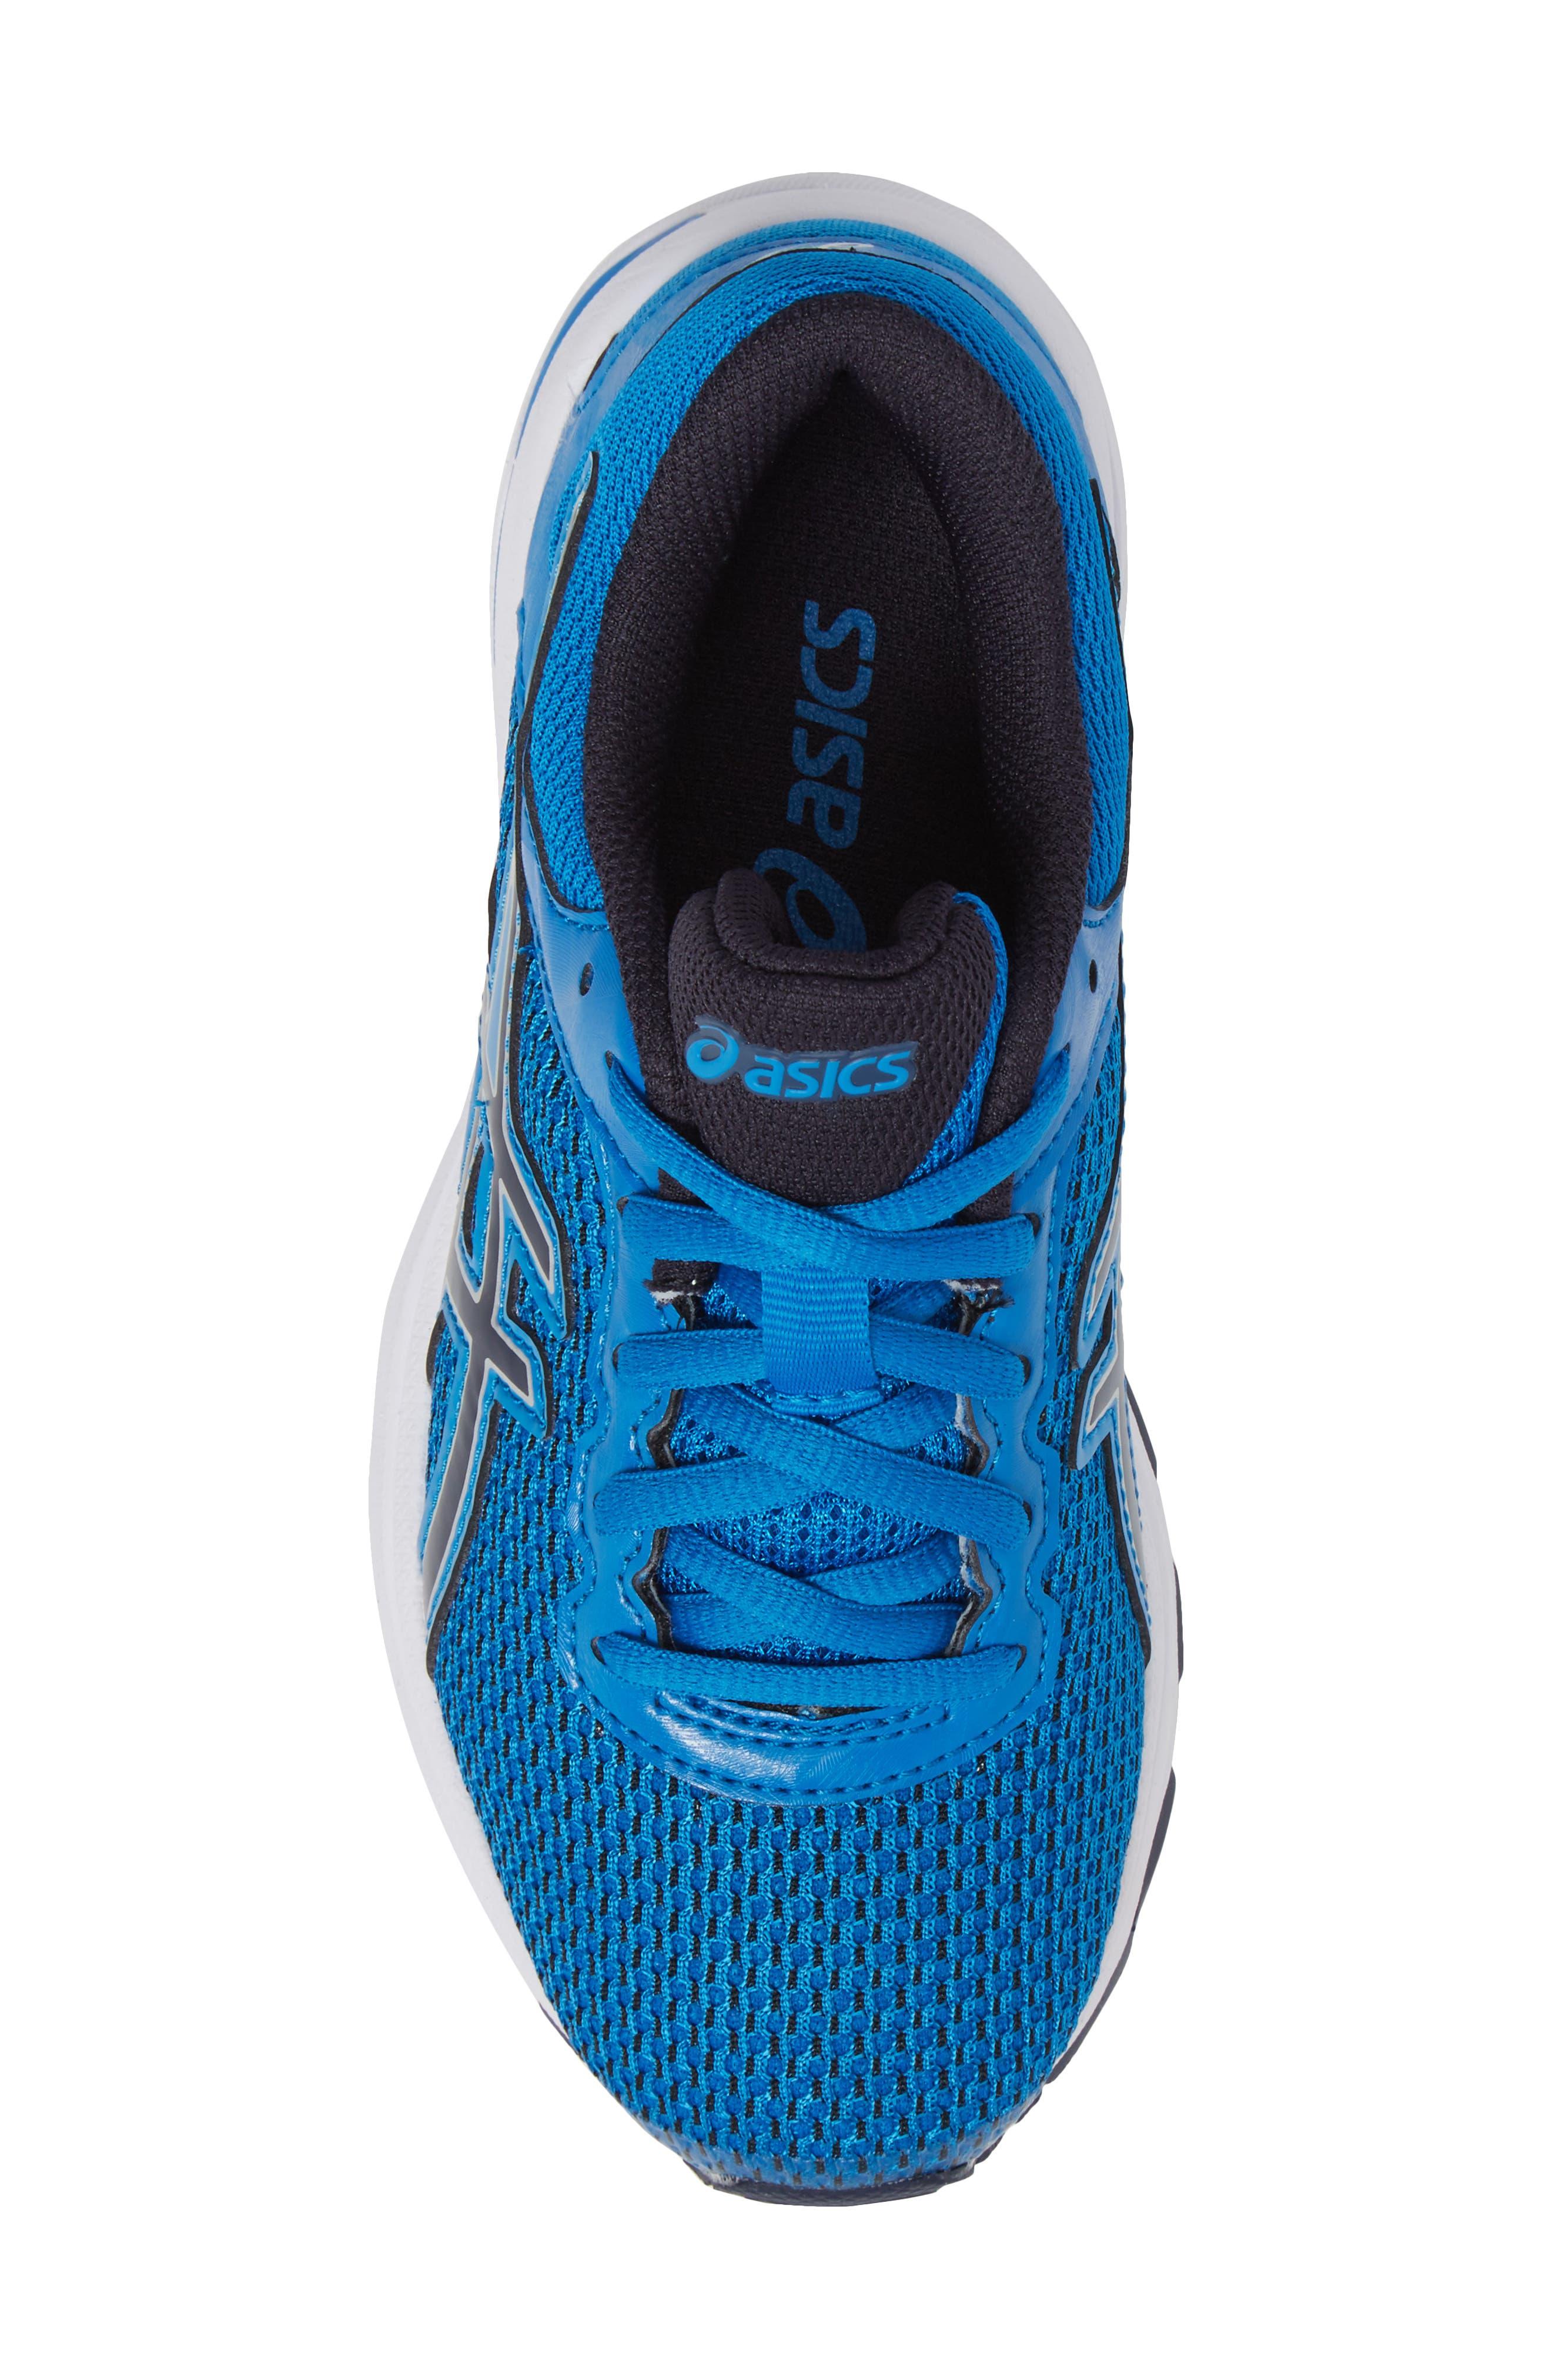 Asics GT-1000<sup>™</sup> 6 GS Sneaker,                             Alternate thumbnail 5, color,                             Blue/ Peacock